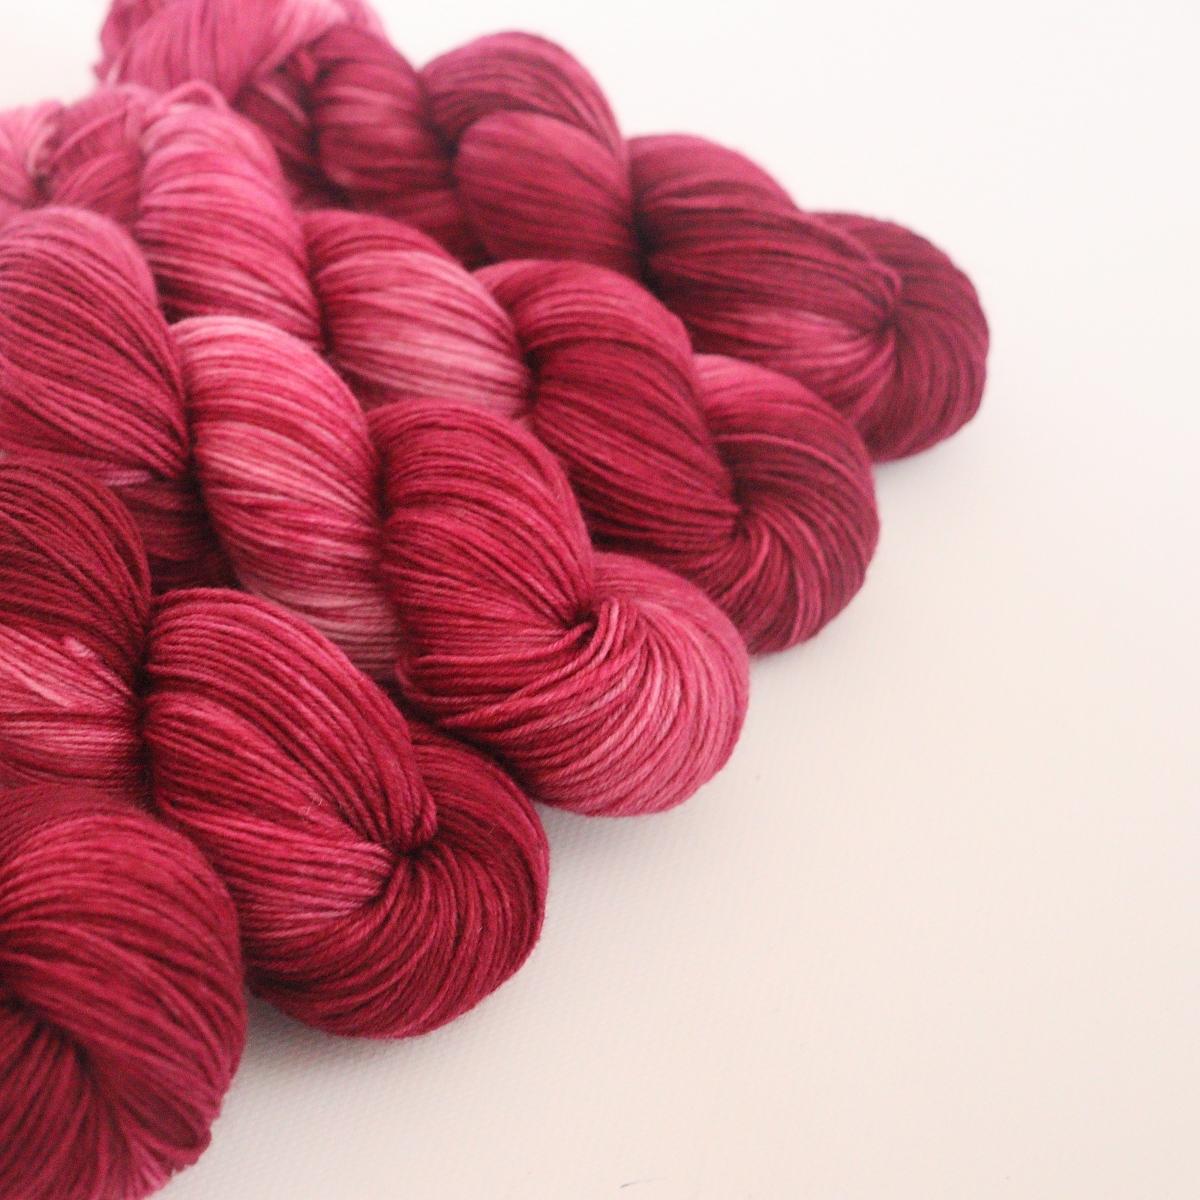 woodico.pro hand dyed yarn 065 1 1200x1200 - Hand dyed yarn / 065